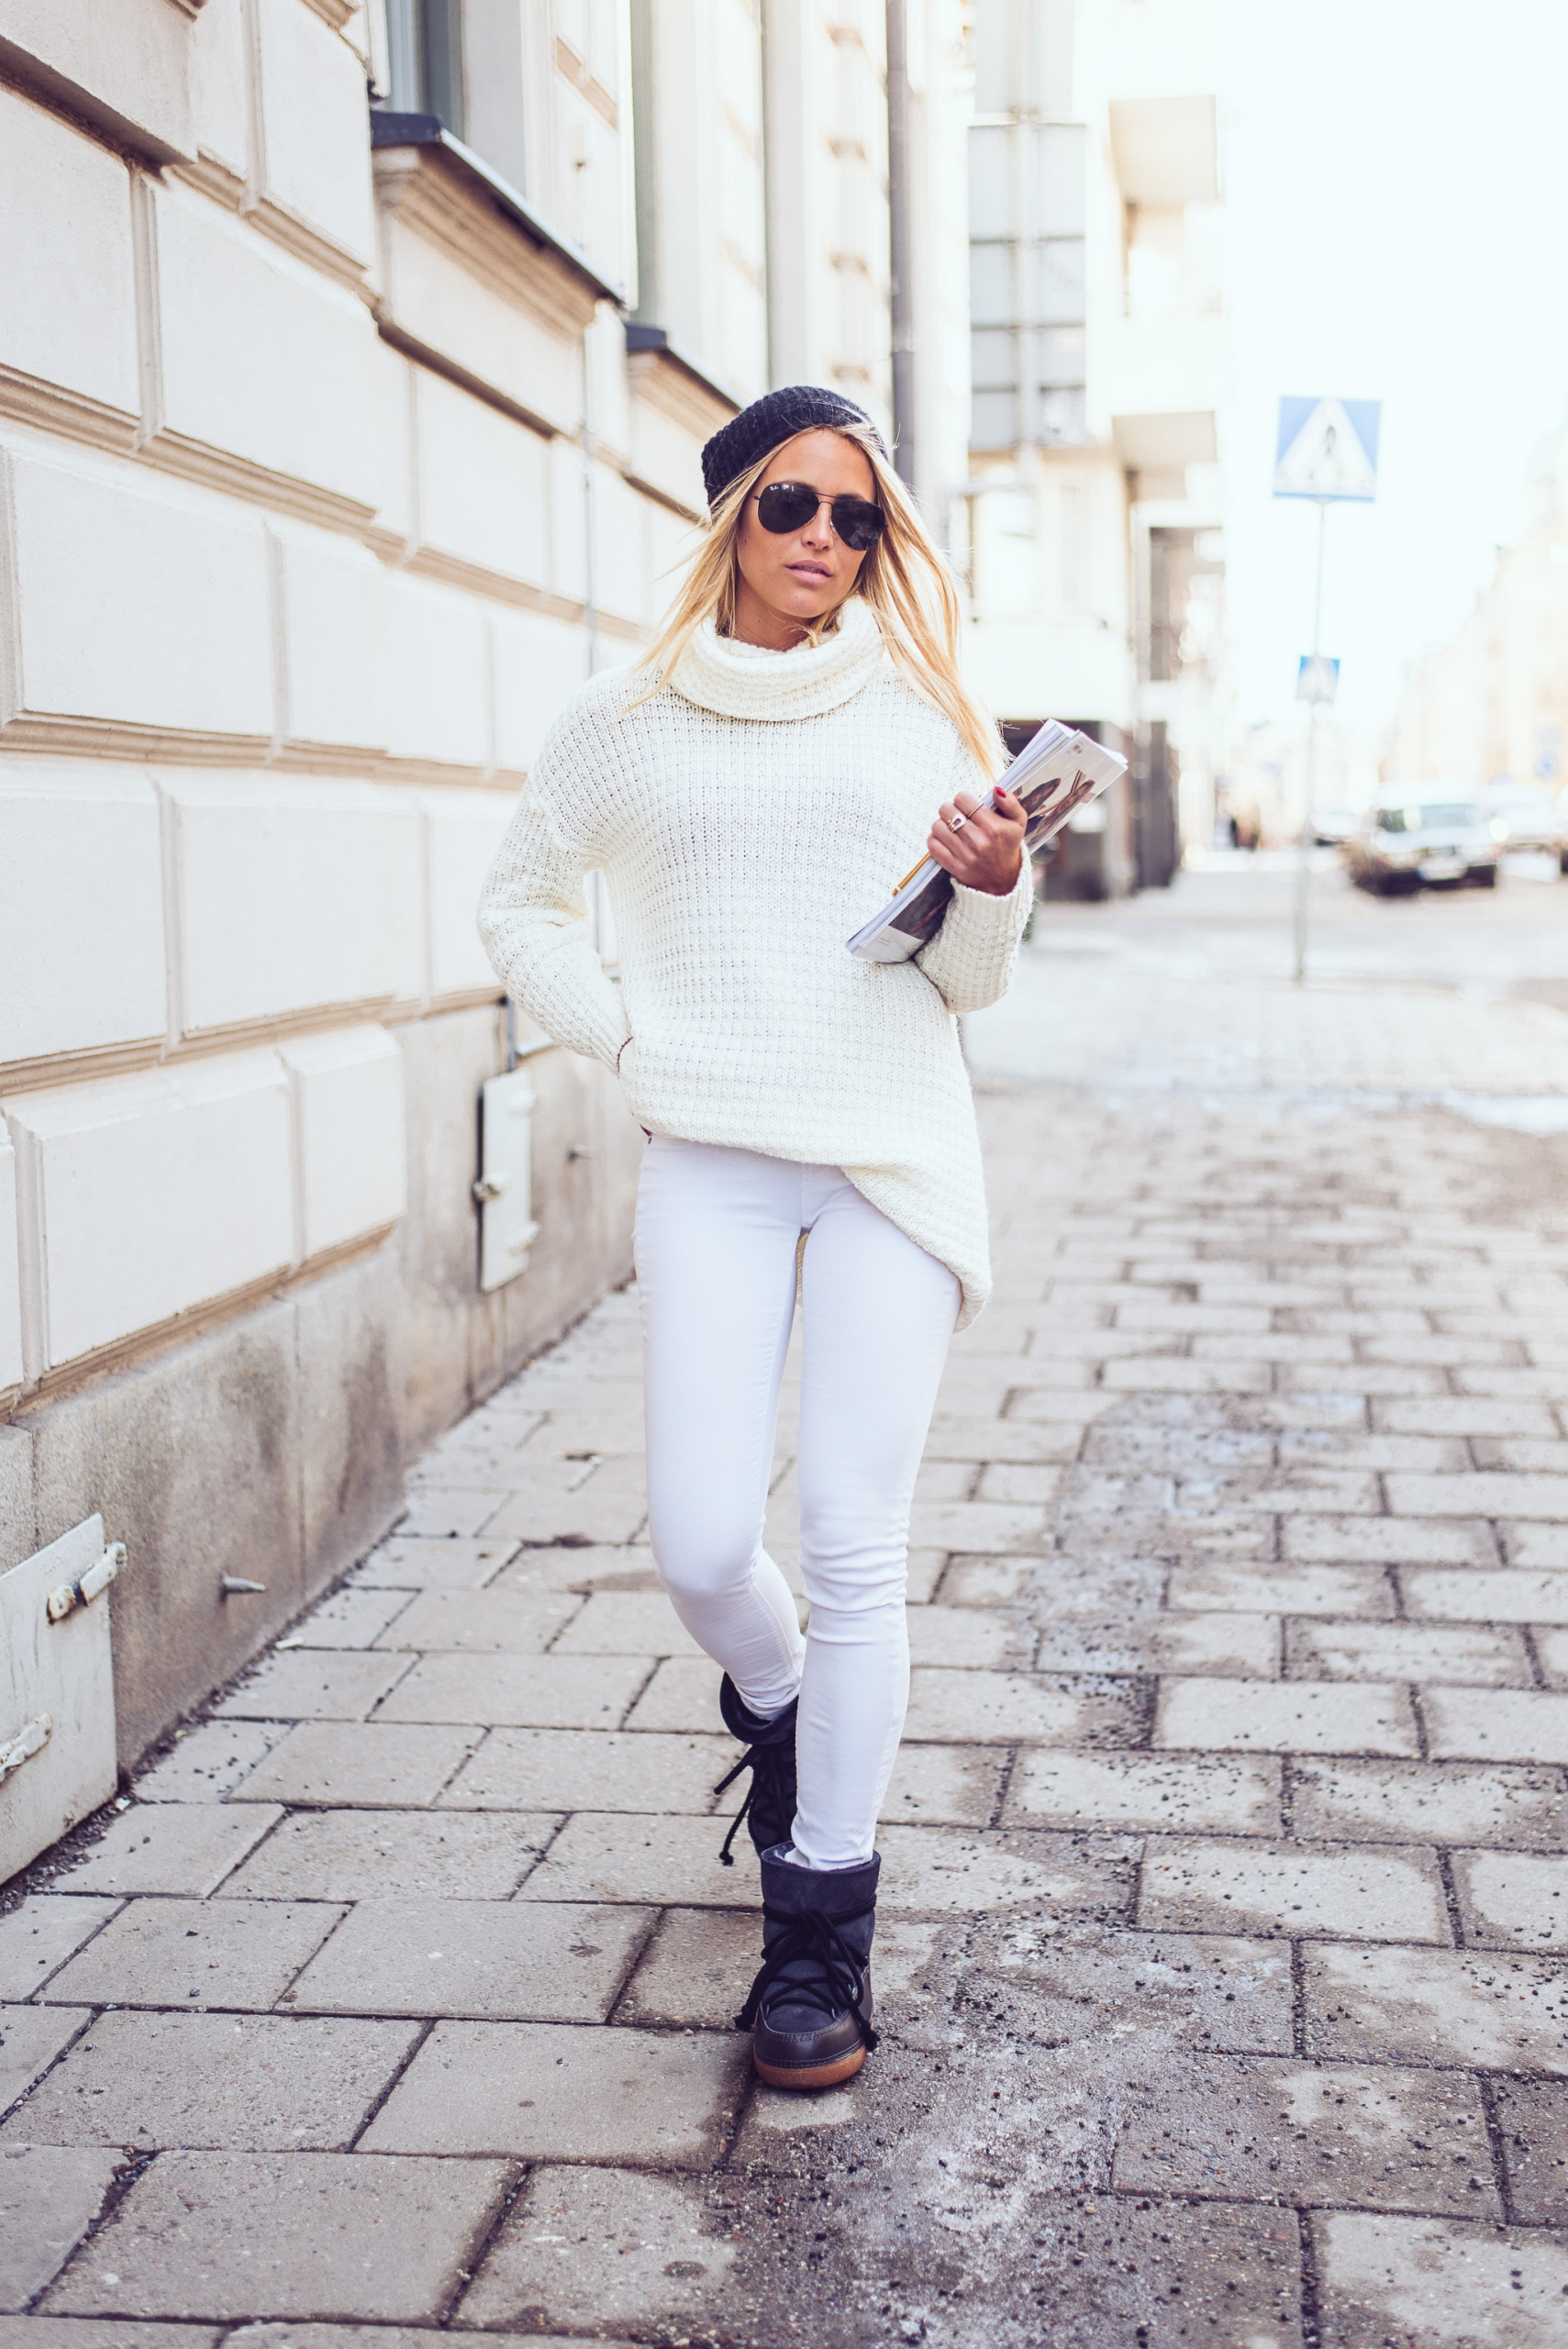 janni-deler-winter-boots-ikkiiDSC_1109